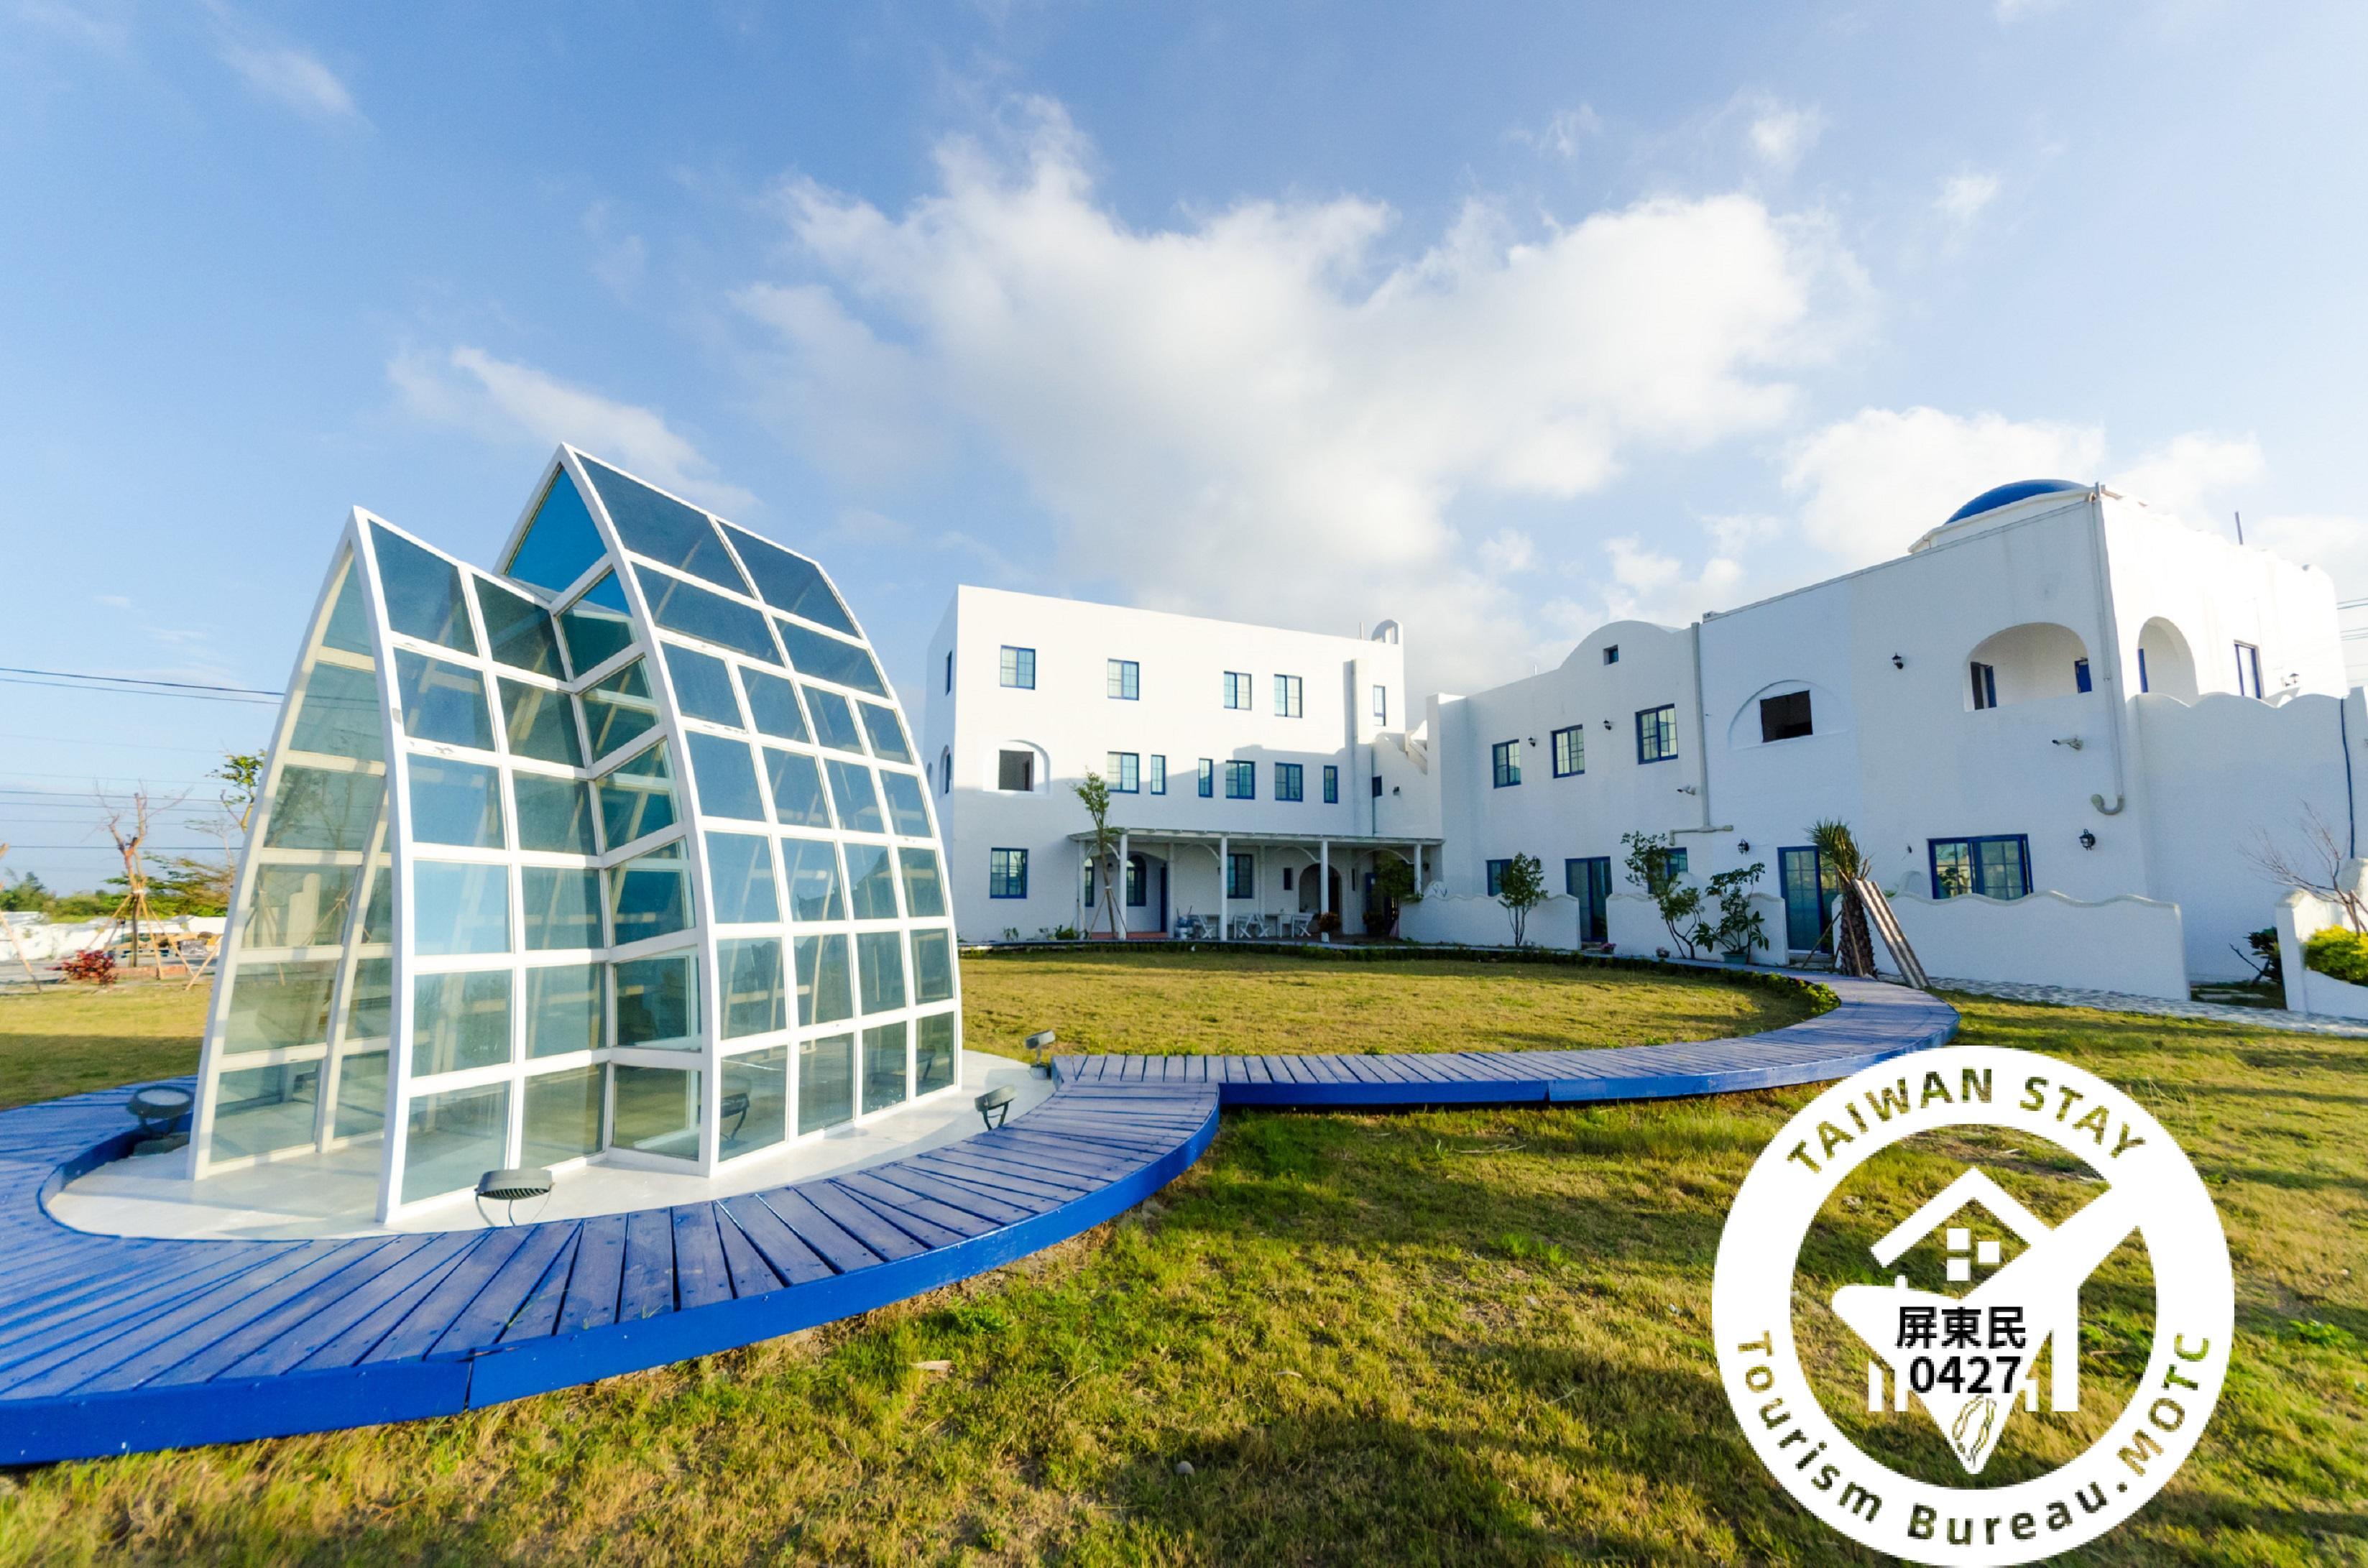 C'est La Vie Villa 小迷鹿位於近恆春鎮入口處,一棟地中海風情的藍白色調建築  在進大門時便看見一座水晶教堂,以木板拼湊成一個愛心步道,浪漫的設計成了新人許下承諾的願望